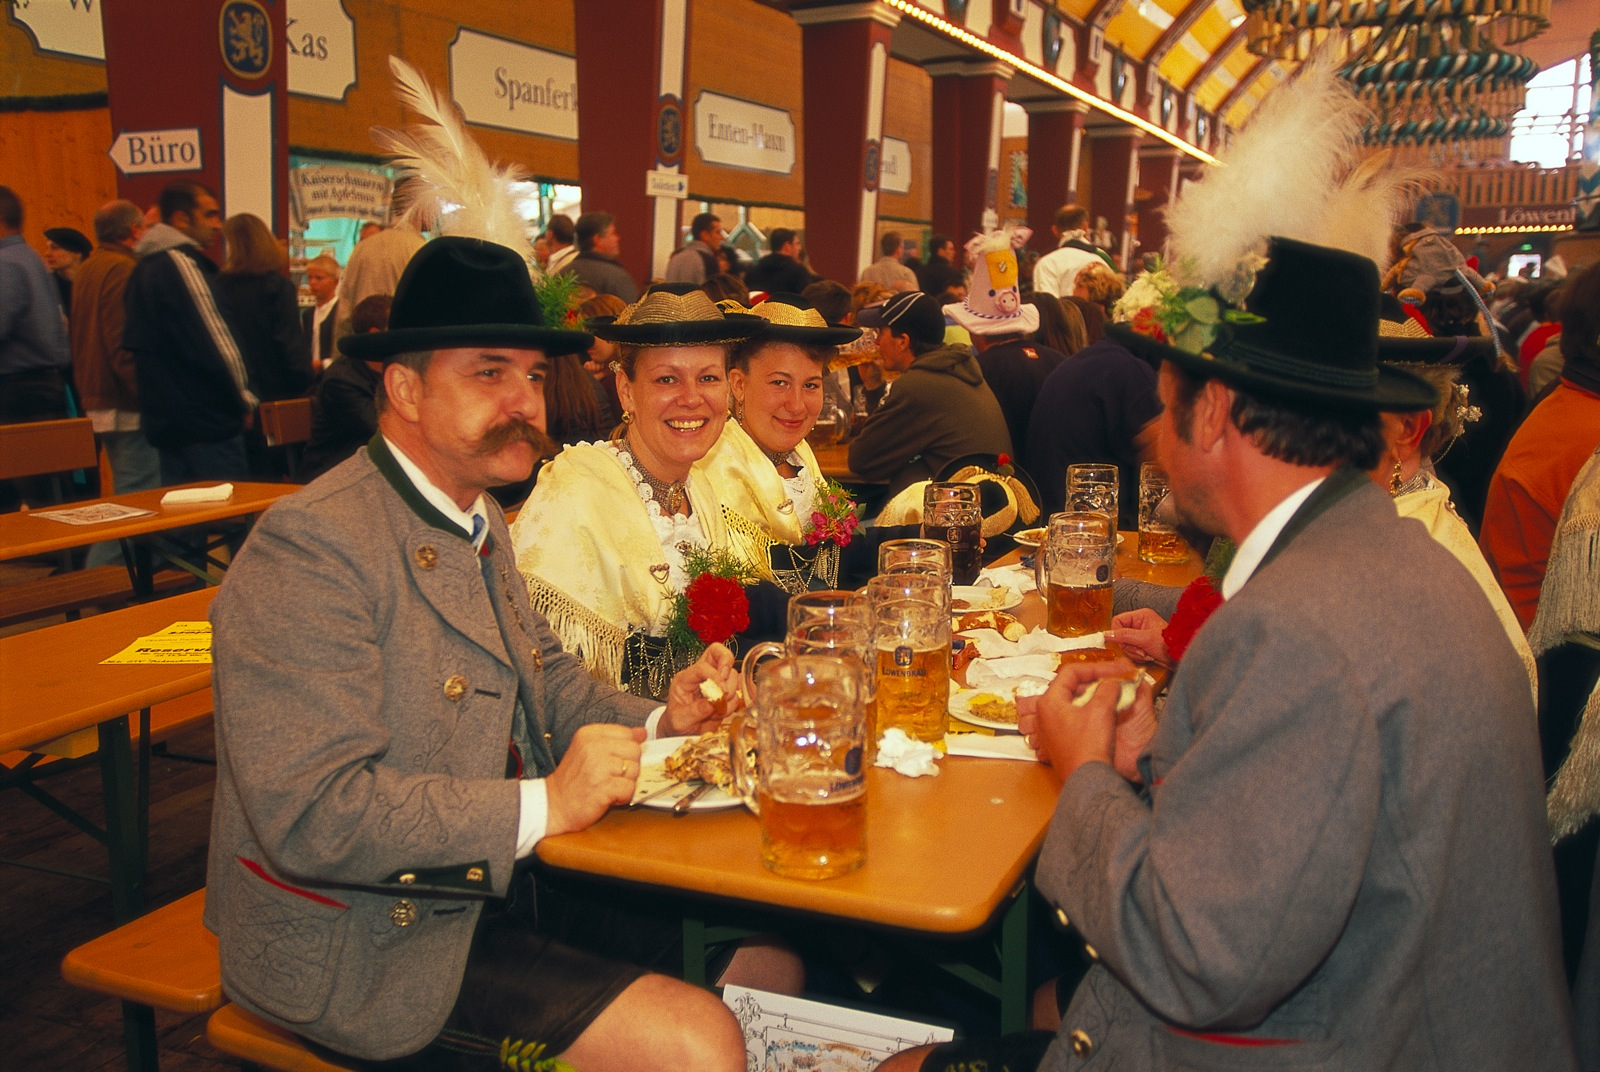 Oktoberfest German National Tourist Board   13